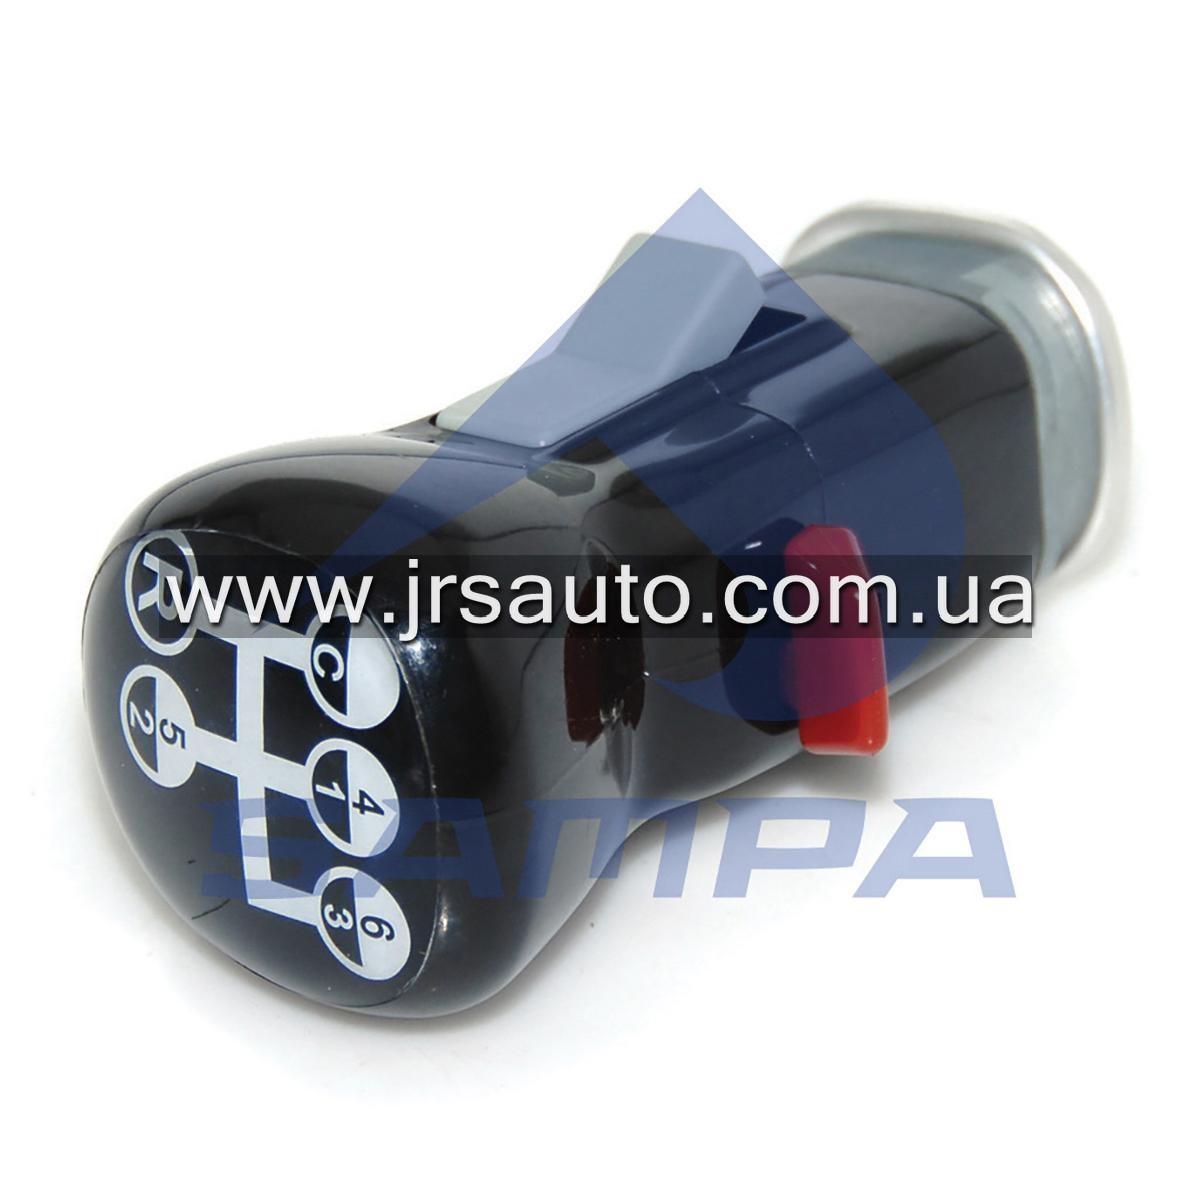 Рукоятка рычаг коробки передач (КПП) VOLVO \276315 \ 031.156